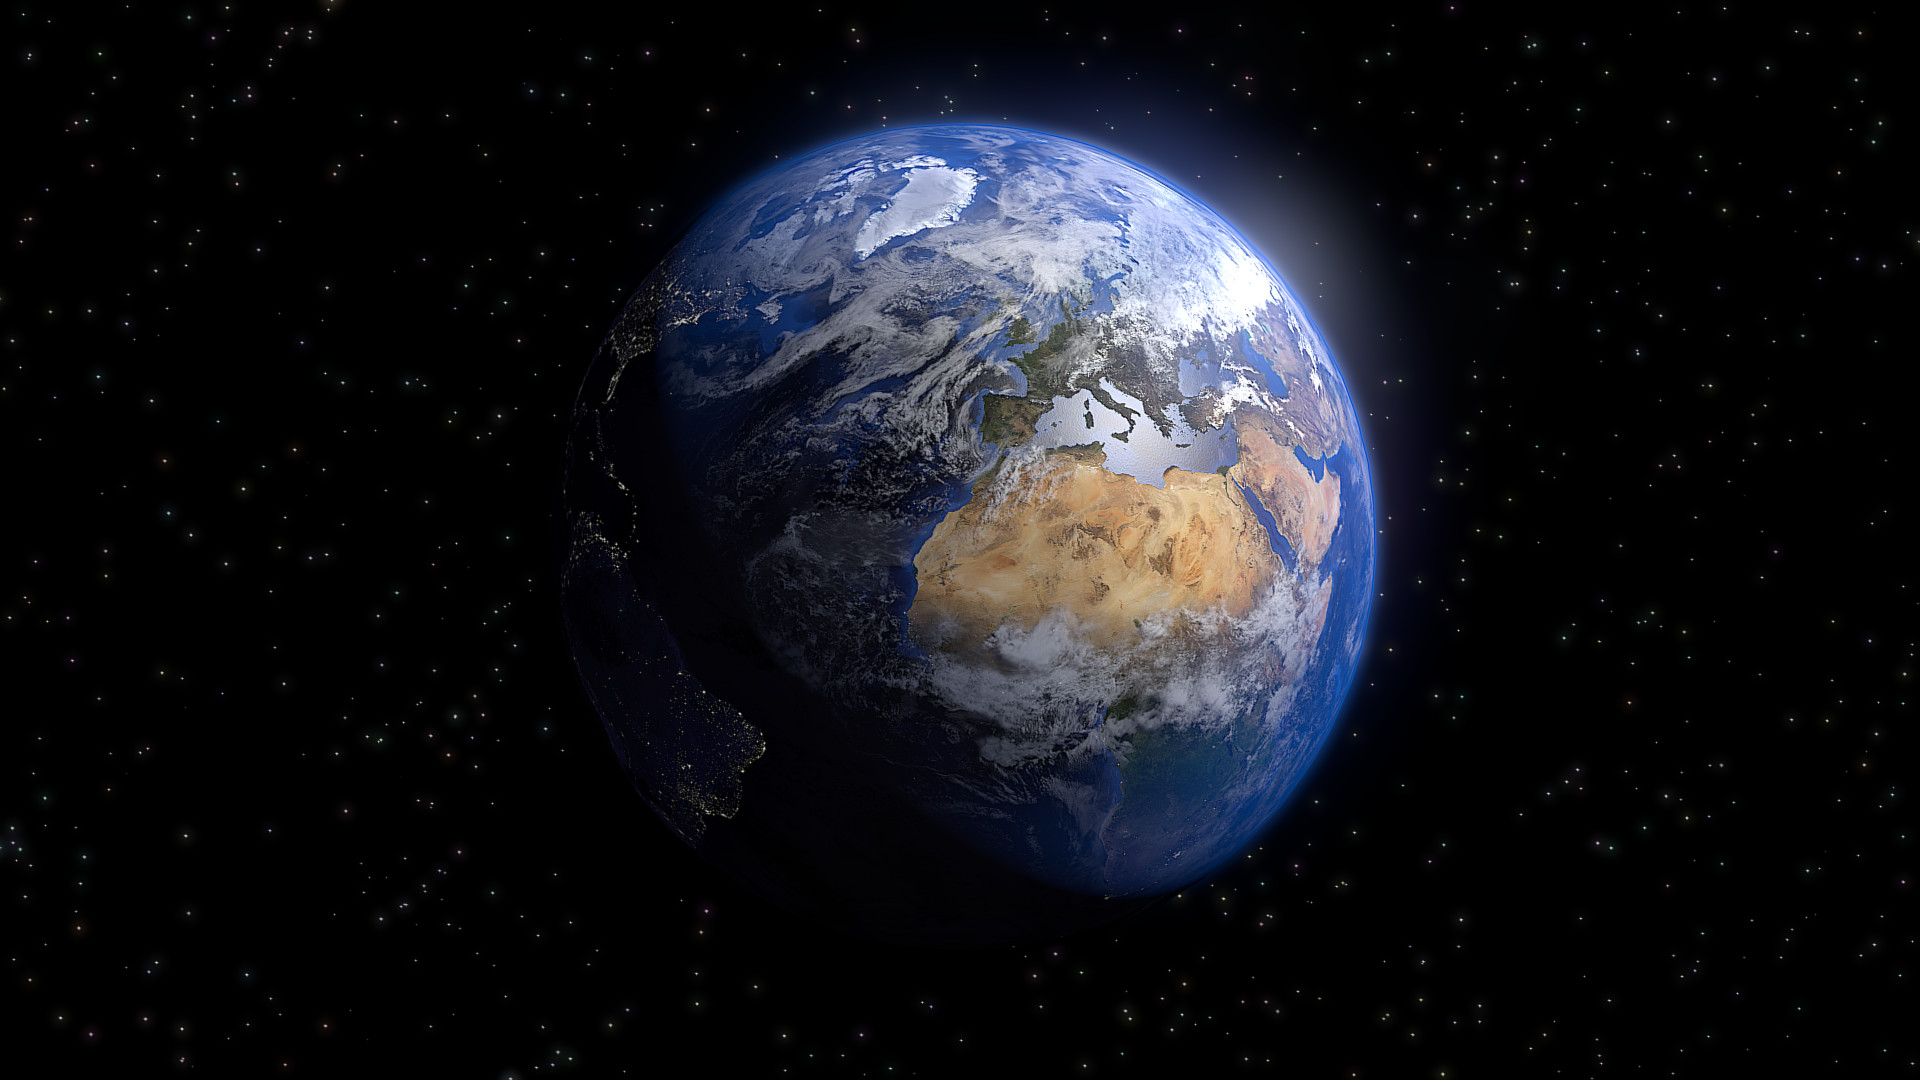 planets surrounding earth - HD1920×1080